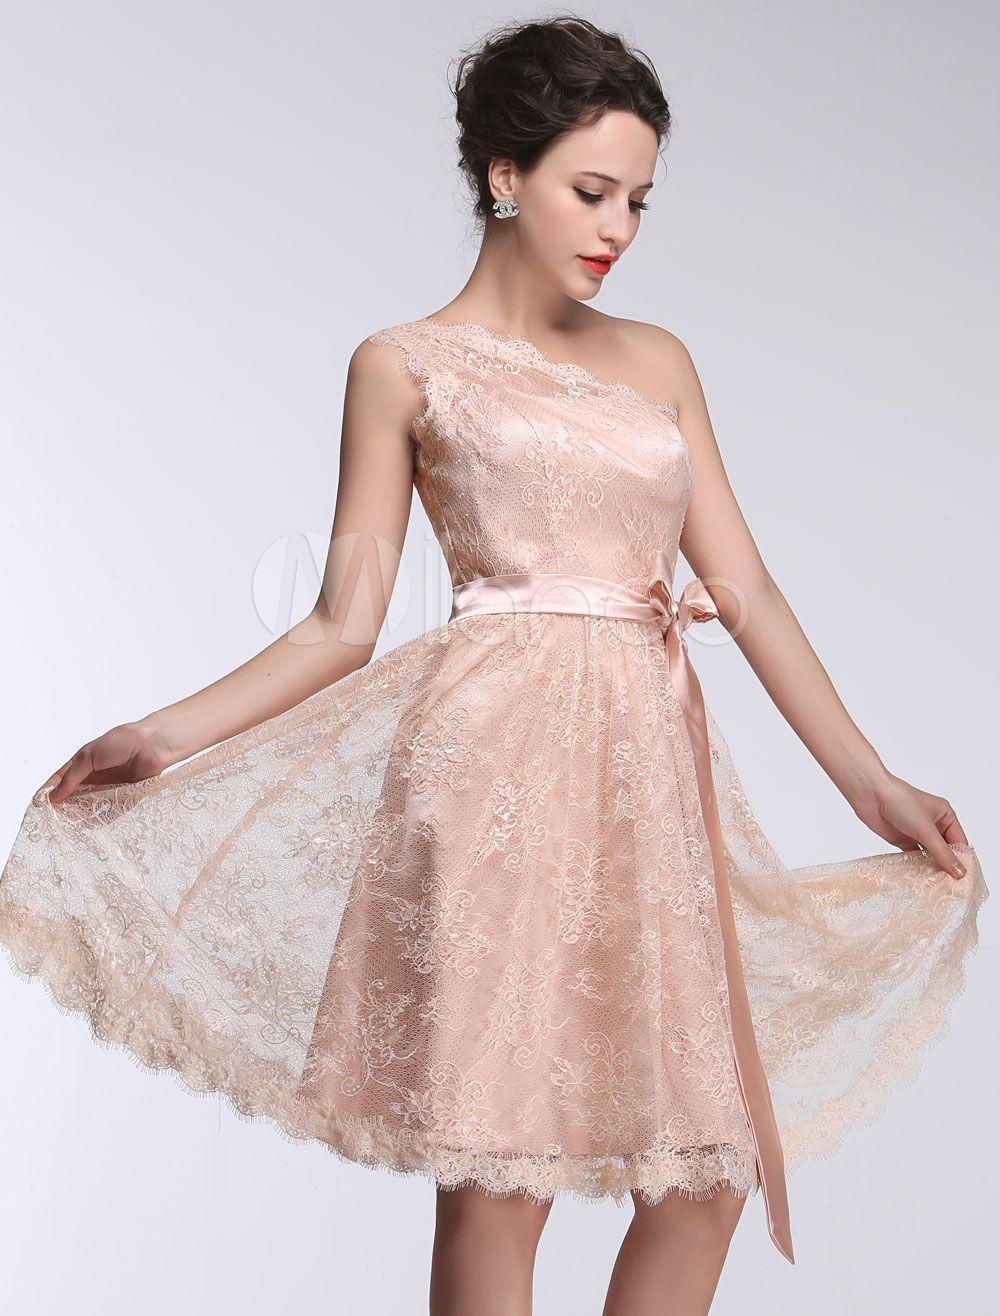 4c9508b154d6 Pink Bridesmaid Dress Lace One Shoulder Short Prom Dress Sleeveless A Line  Ribbon Bow Sash Knee